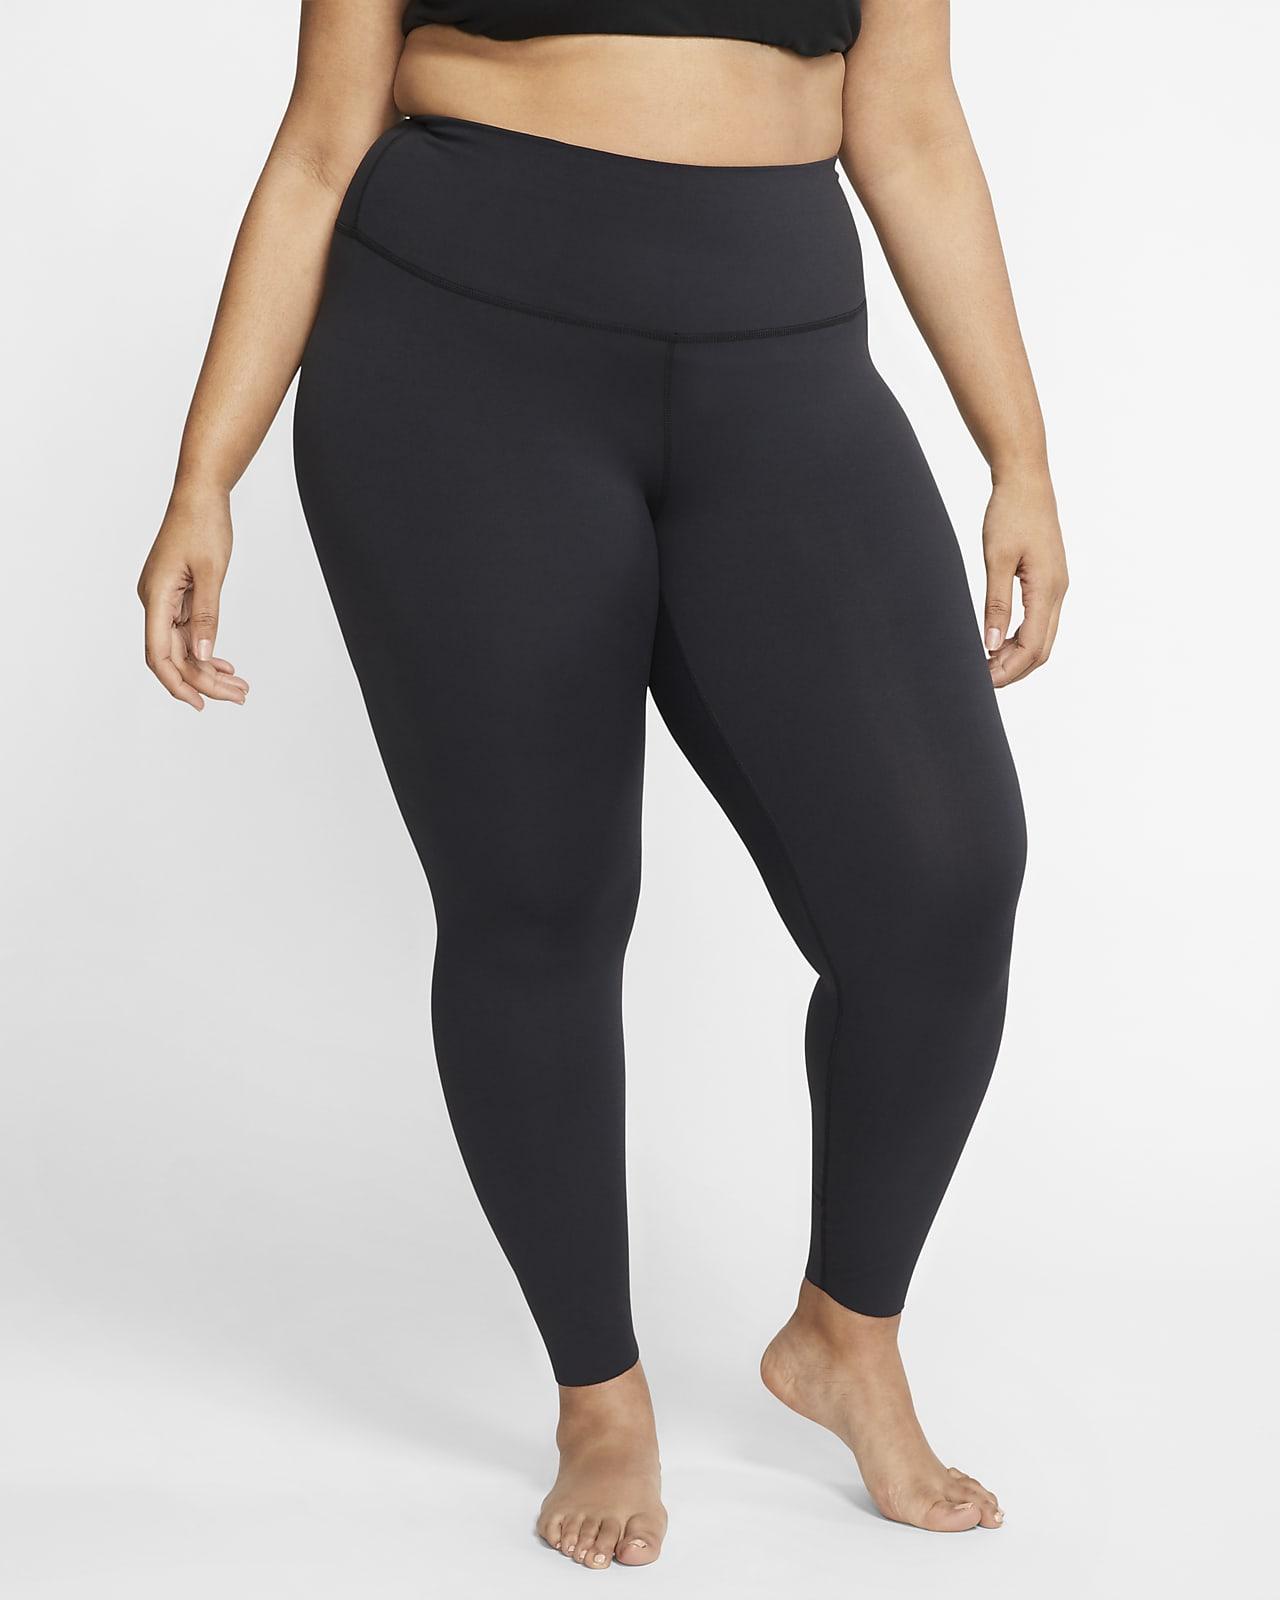 Legging taille haute 7/8 Infinalon Nike Yoga Luxe pour Femme (grande taille)